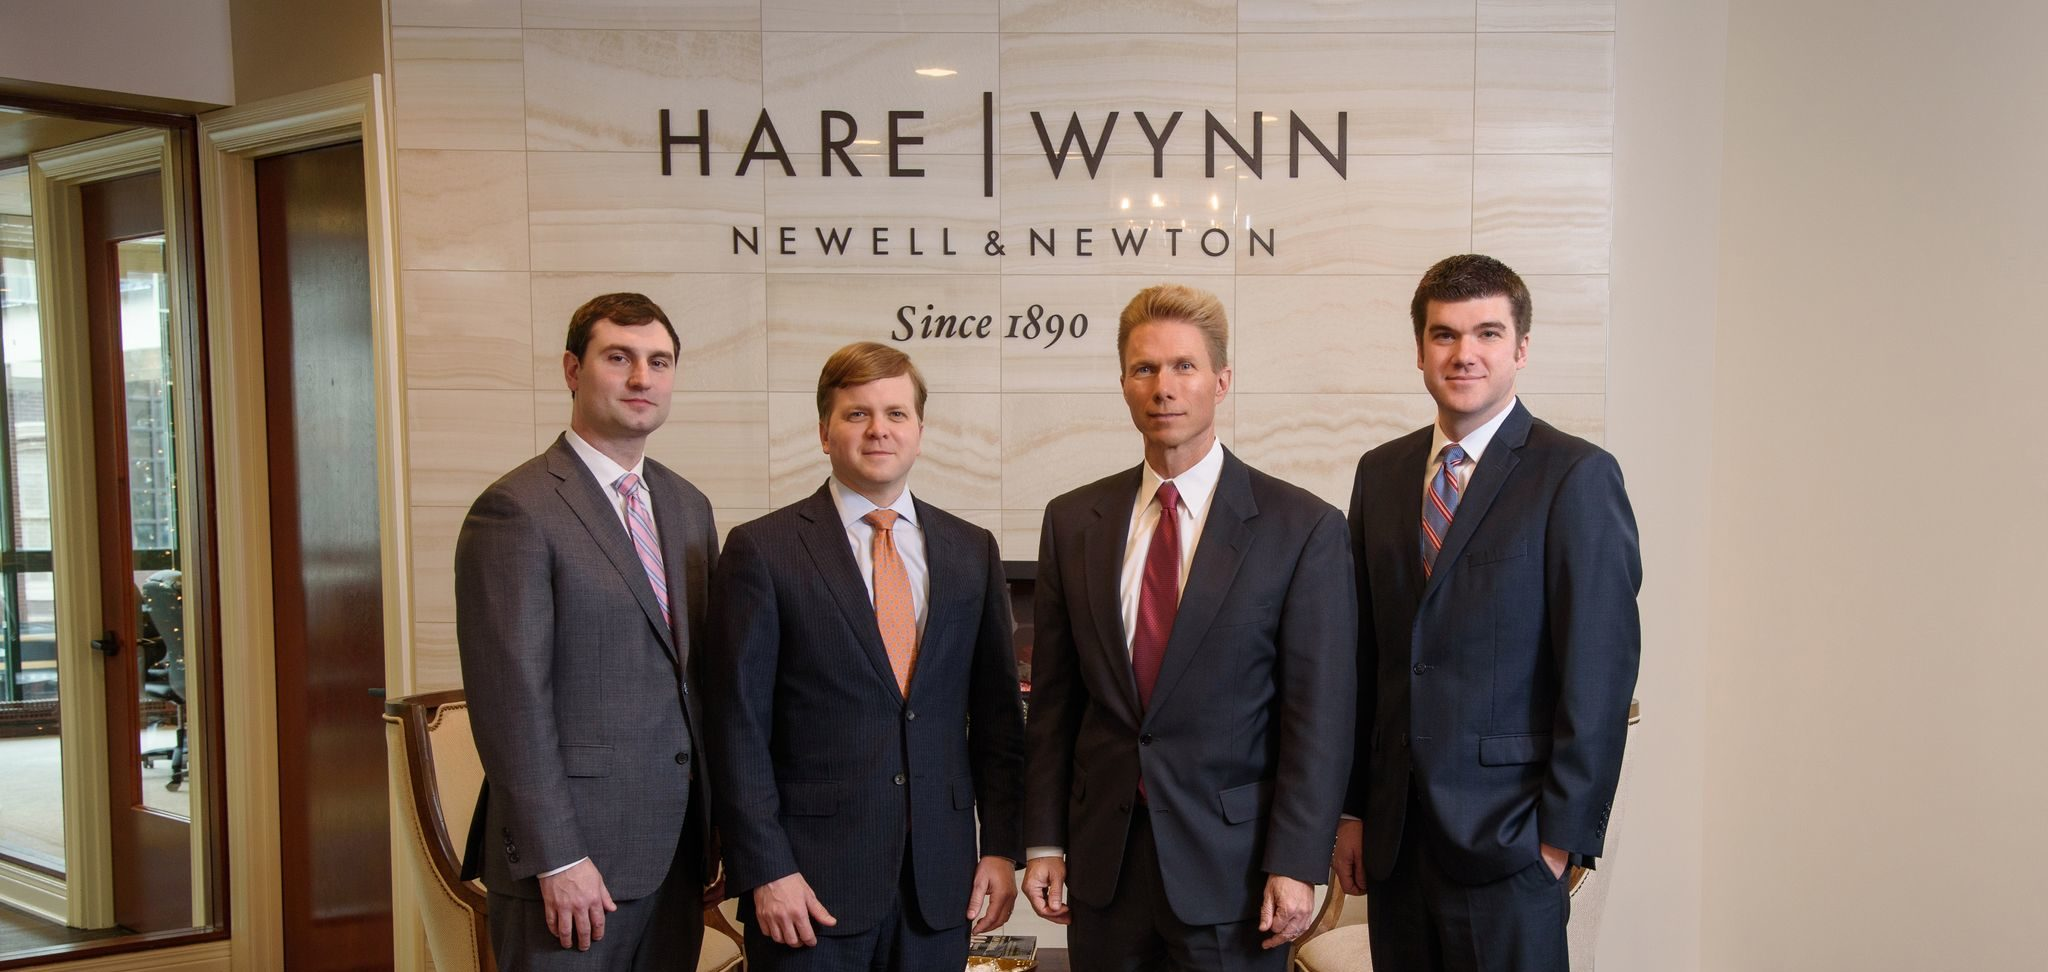 Hare Wynn Accident & Injury Lawyers - 325 W Main St #210 Lexington, KY 40507